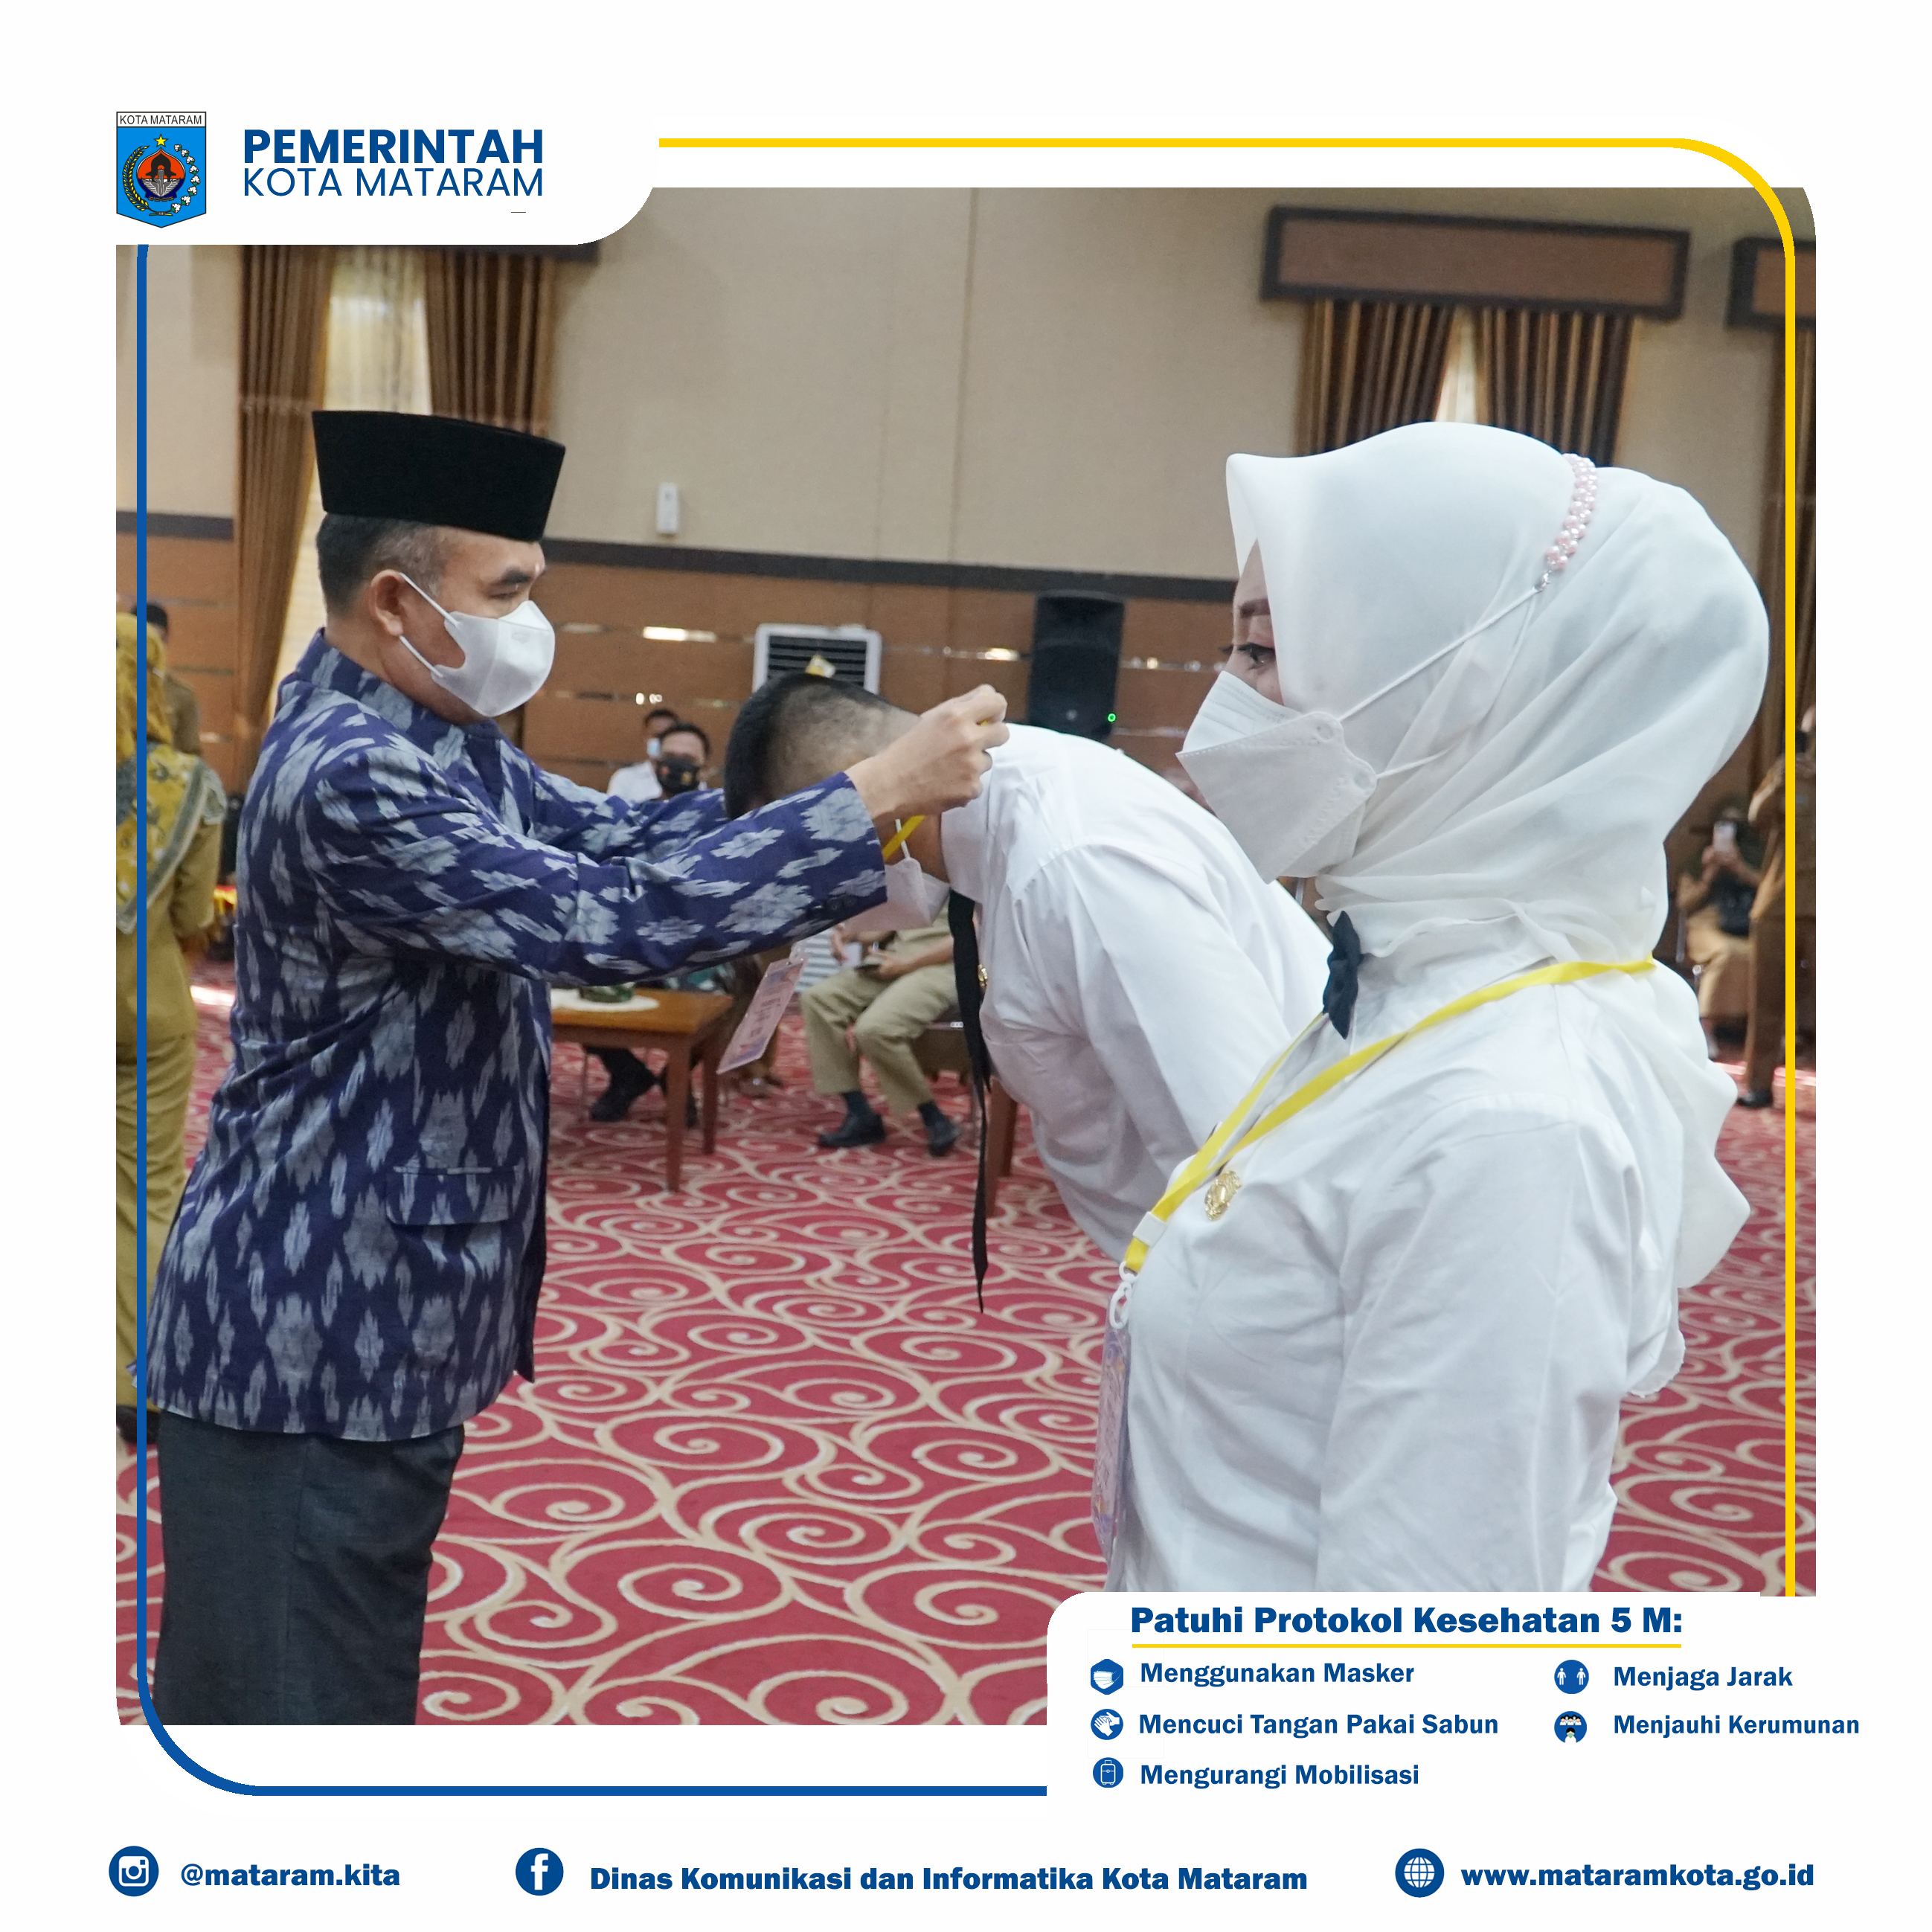 Pembukaan Pelatihan Dasar (Latsar) Calon Pegawai Negeri sipil Pemerintah Kota Mataram Pola Kerja Sama dengan Badan Pengembangan Sumber Daya Manusia Daerah Provinsi NTB Tahun 2021 Menggunakan Metode Pe